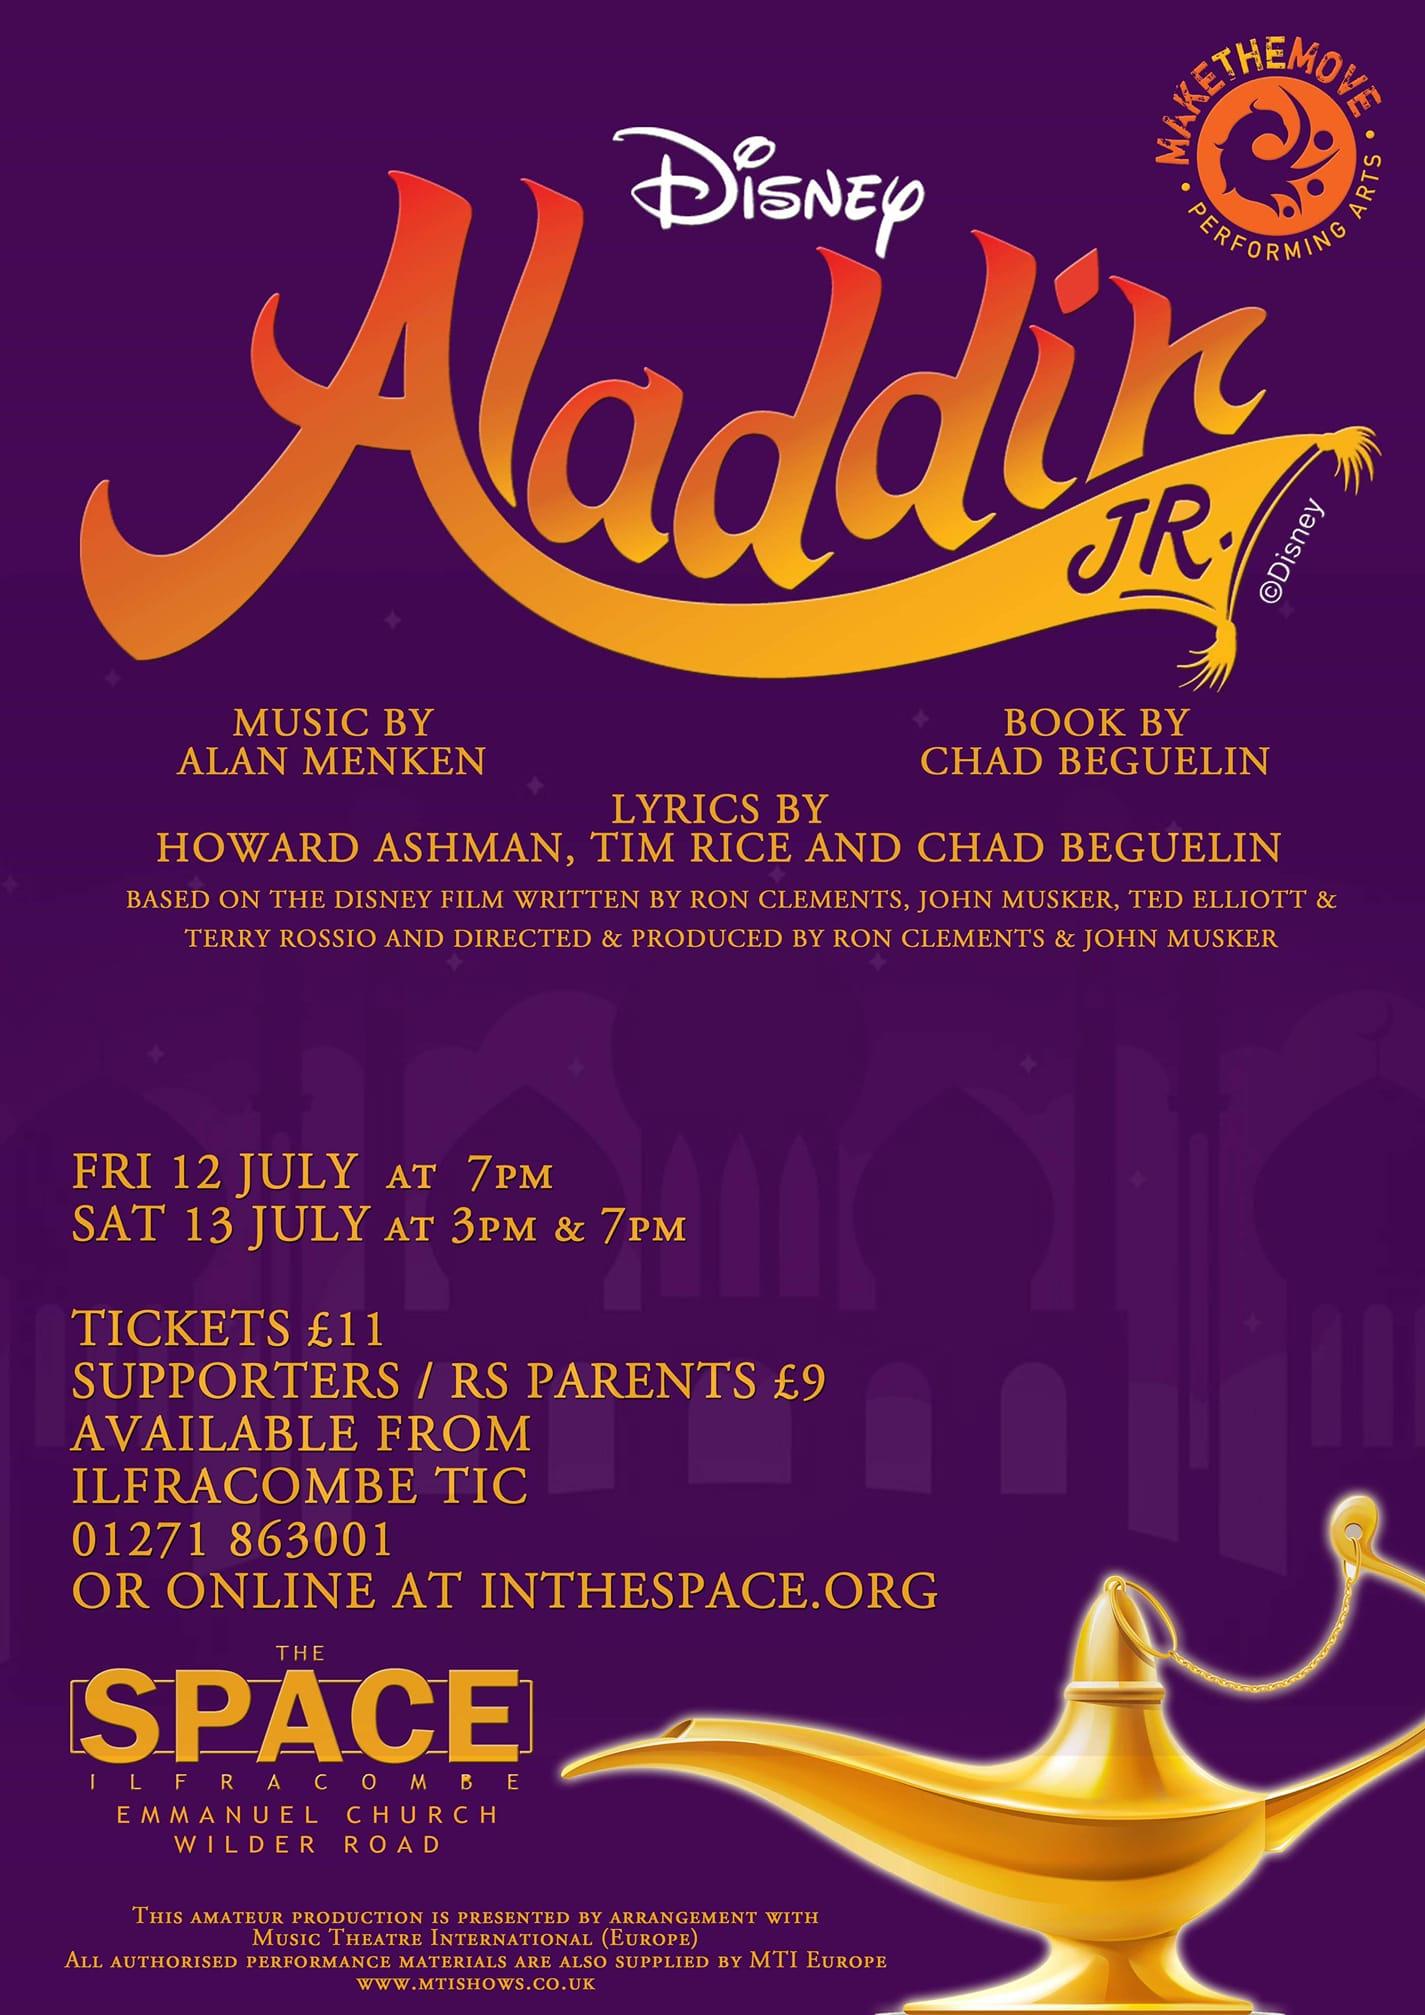 MTM - Disney's Aladdin jnr banner image